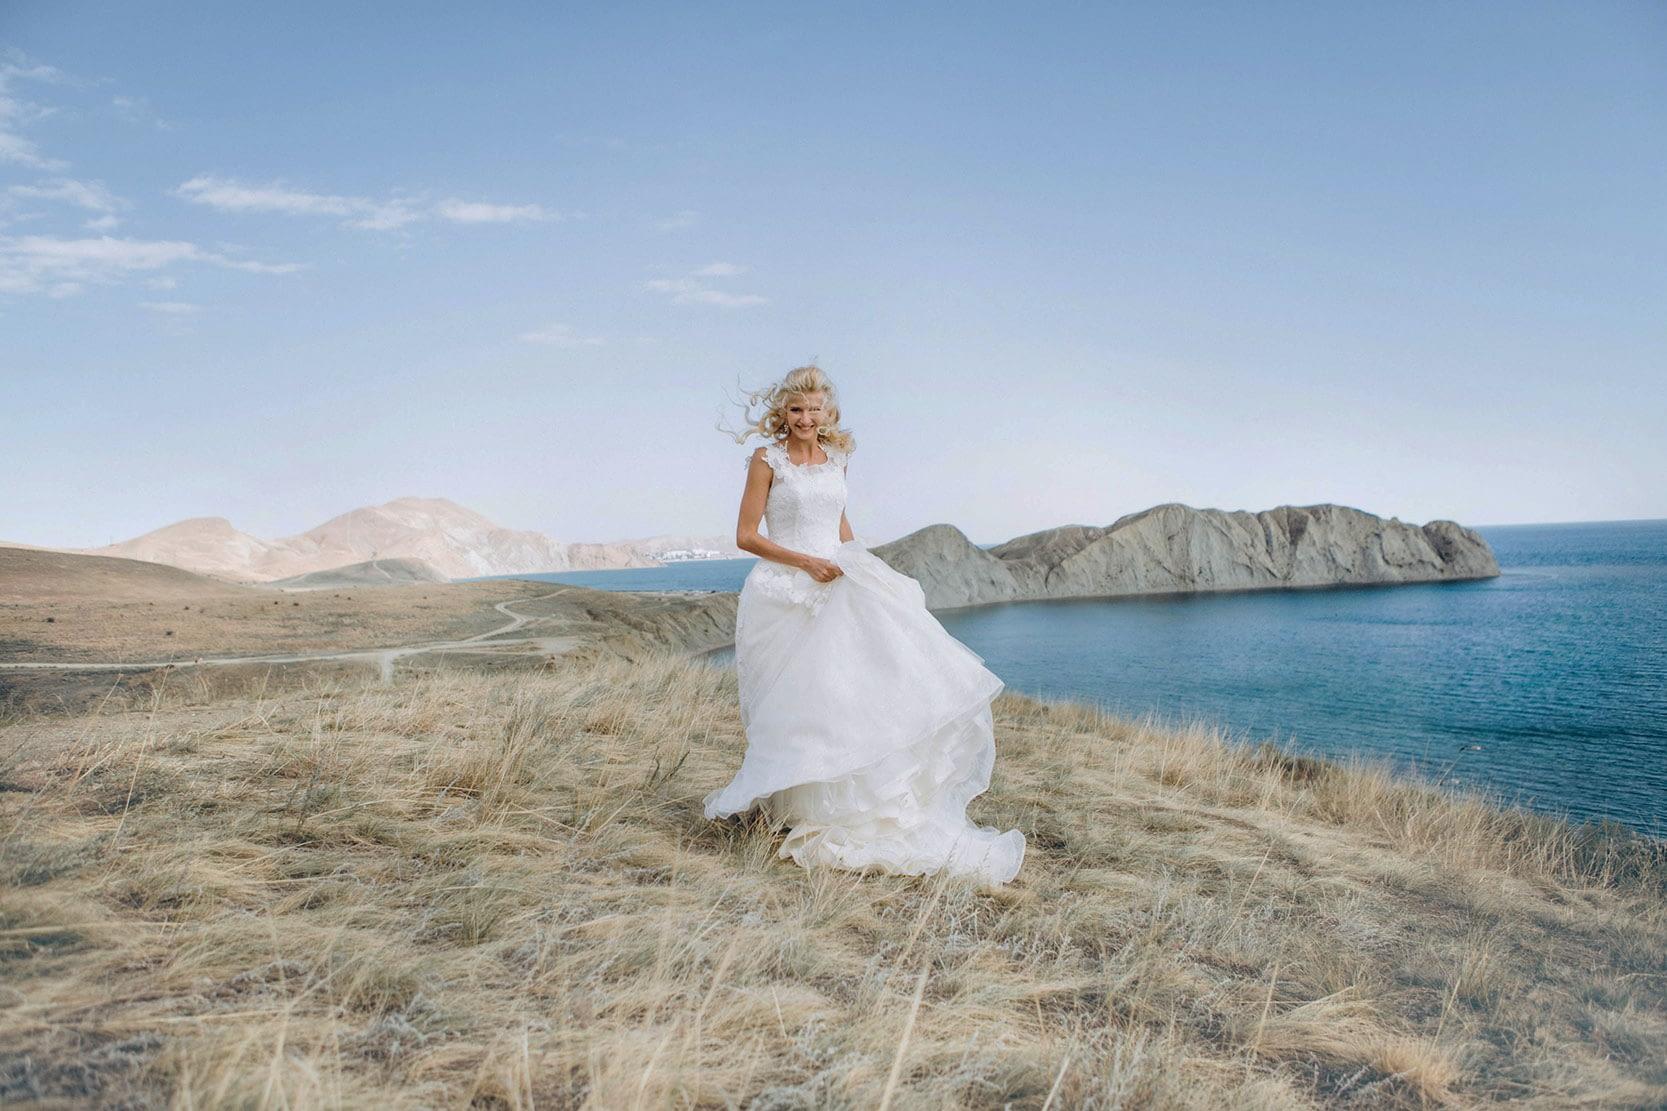 Wedding photo before using Overlay